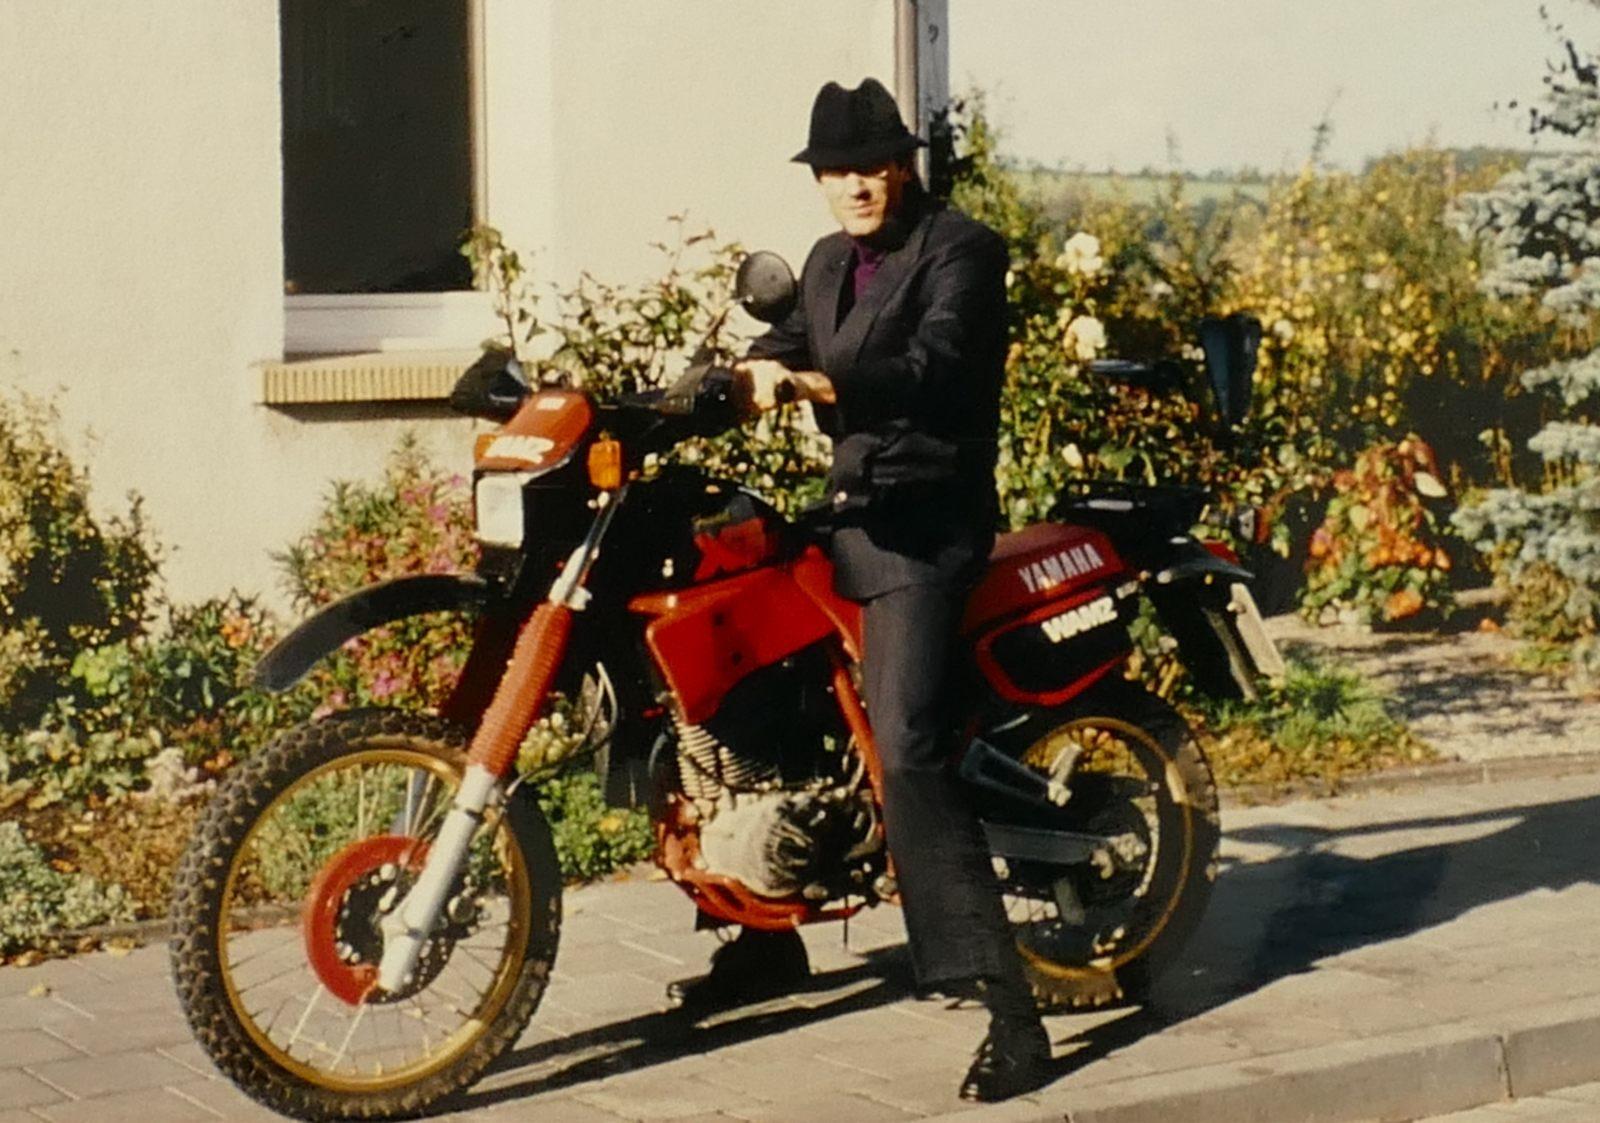 1990 XT600_02_1600